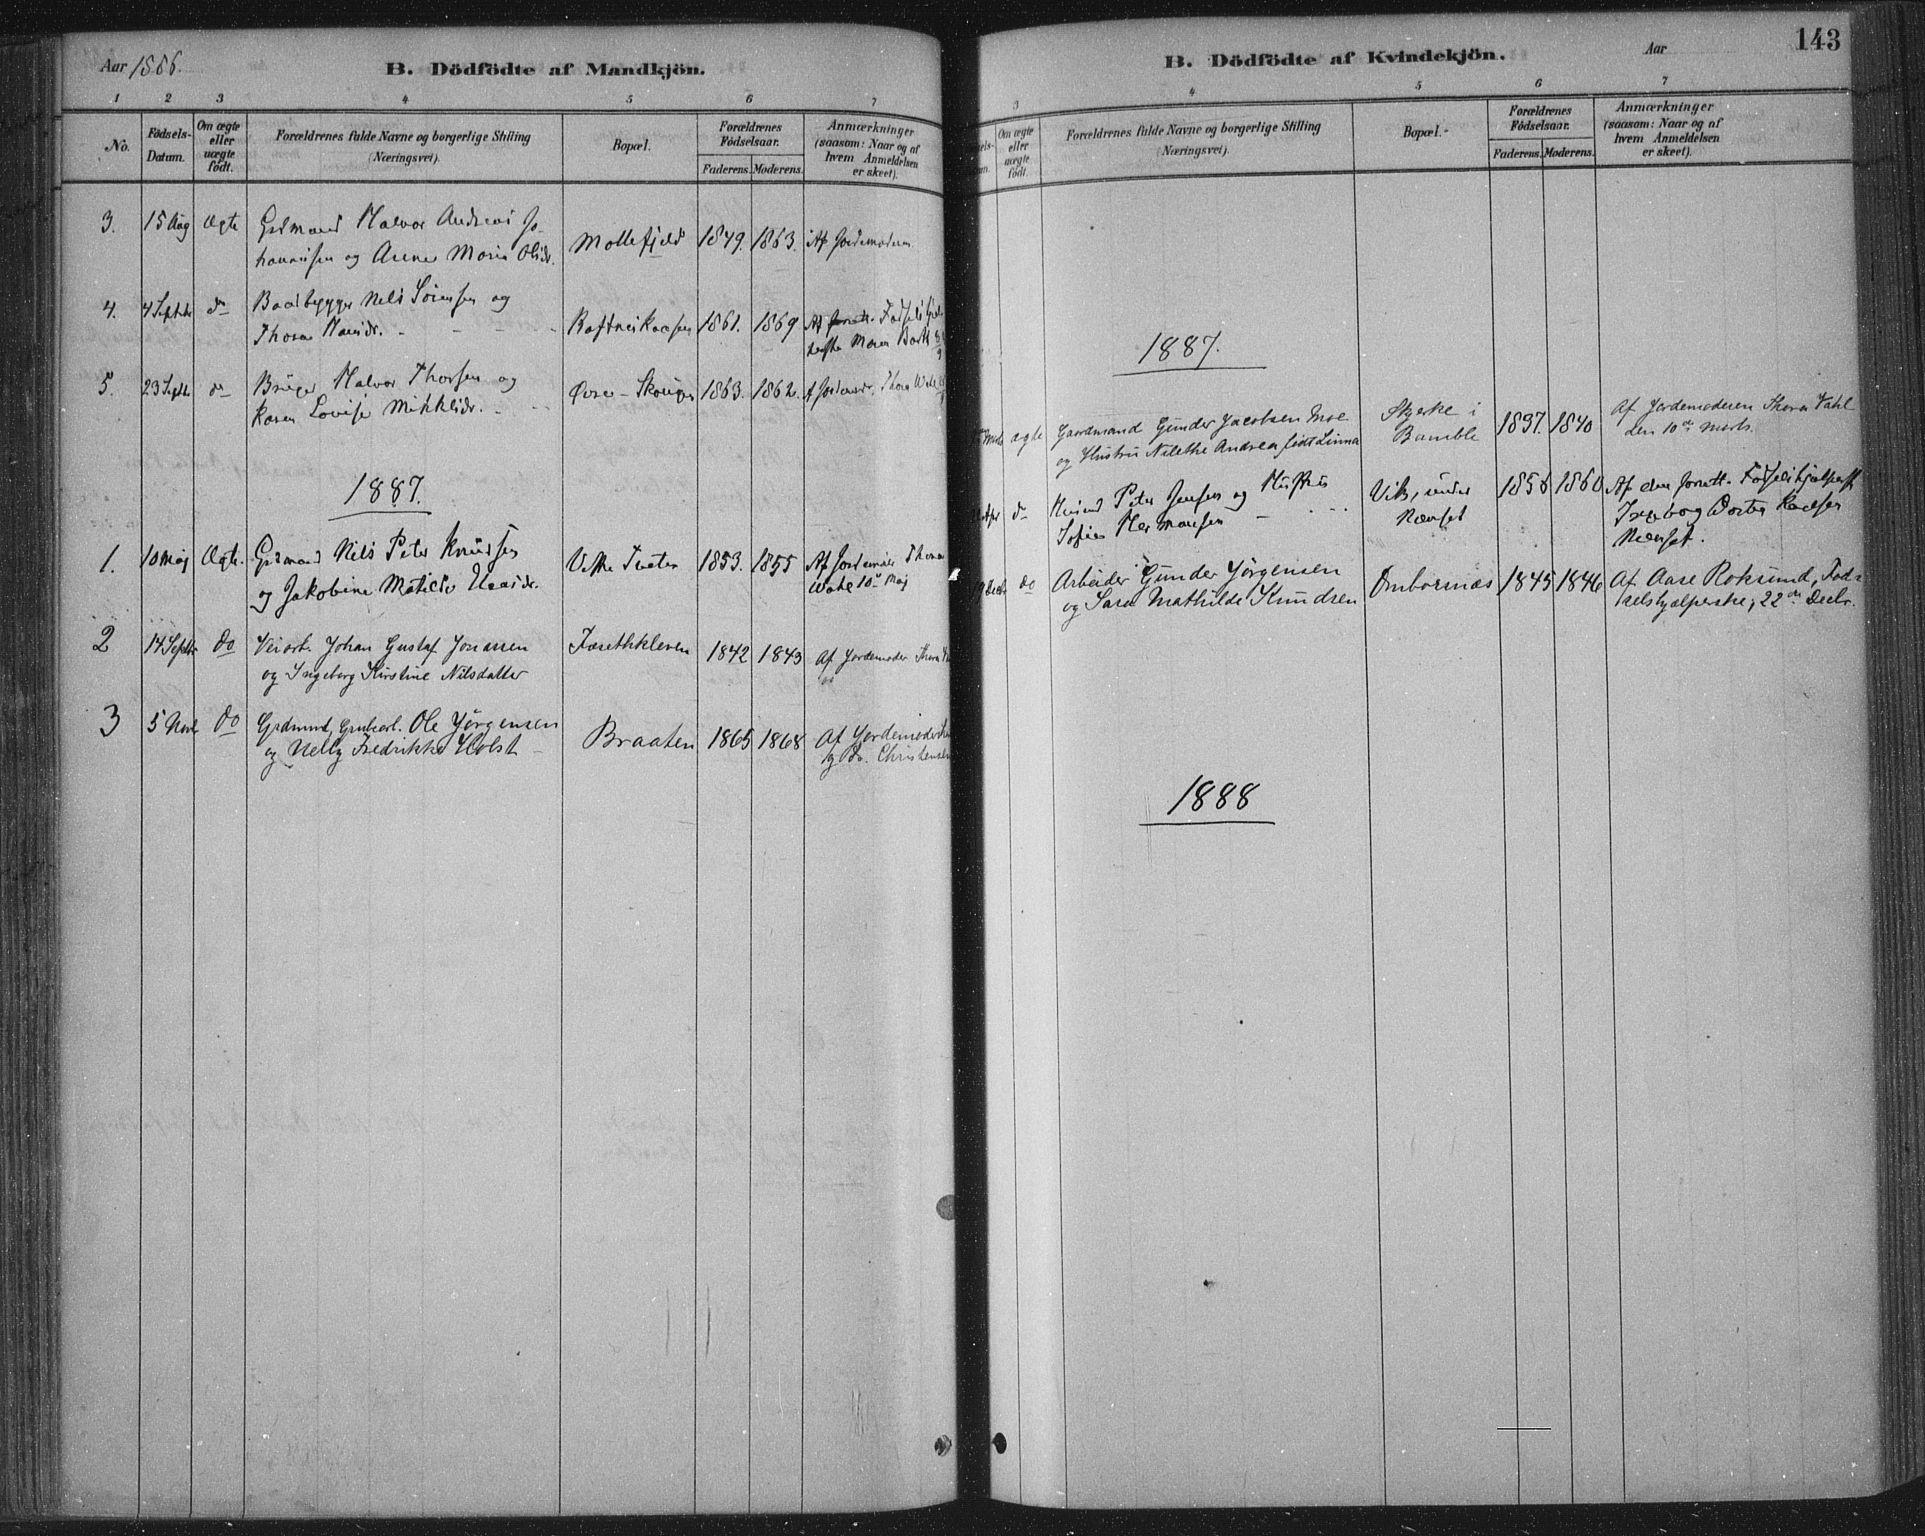 SAKO, Bamble kirkebøker, F/Fa/L0007: Ministerialbok nr. I 7, 1878-1888, s. 143